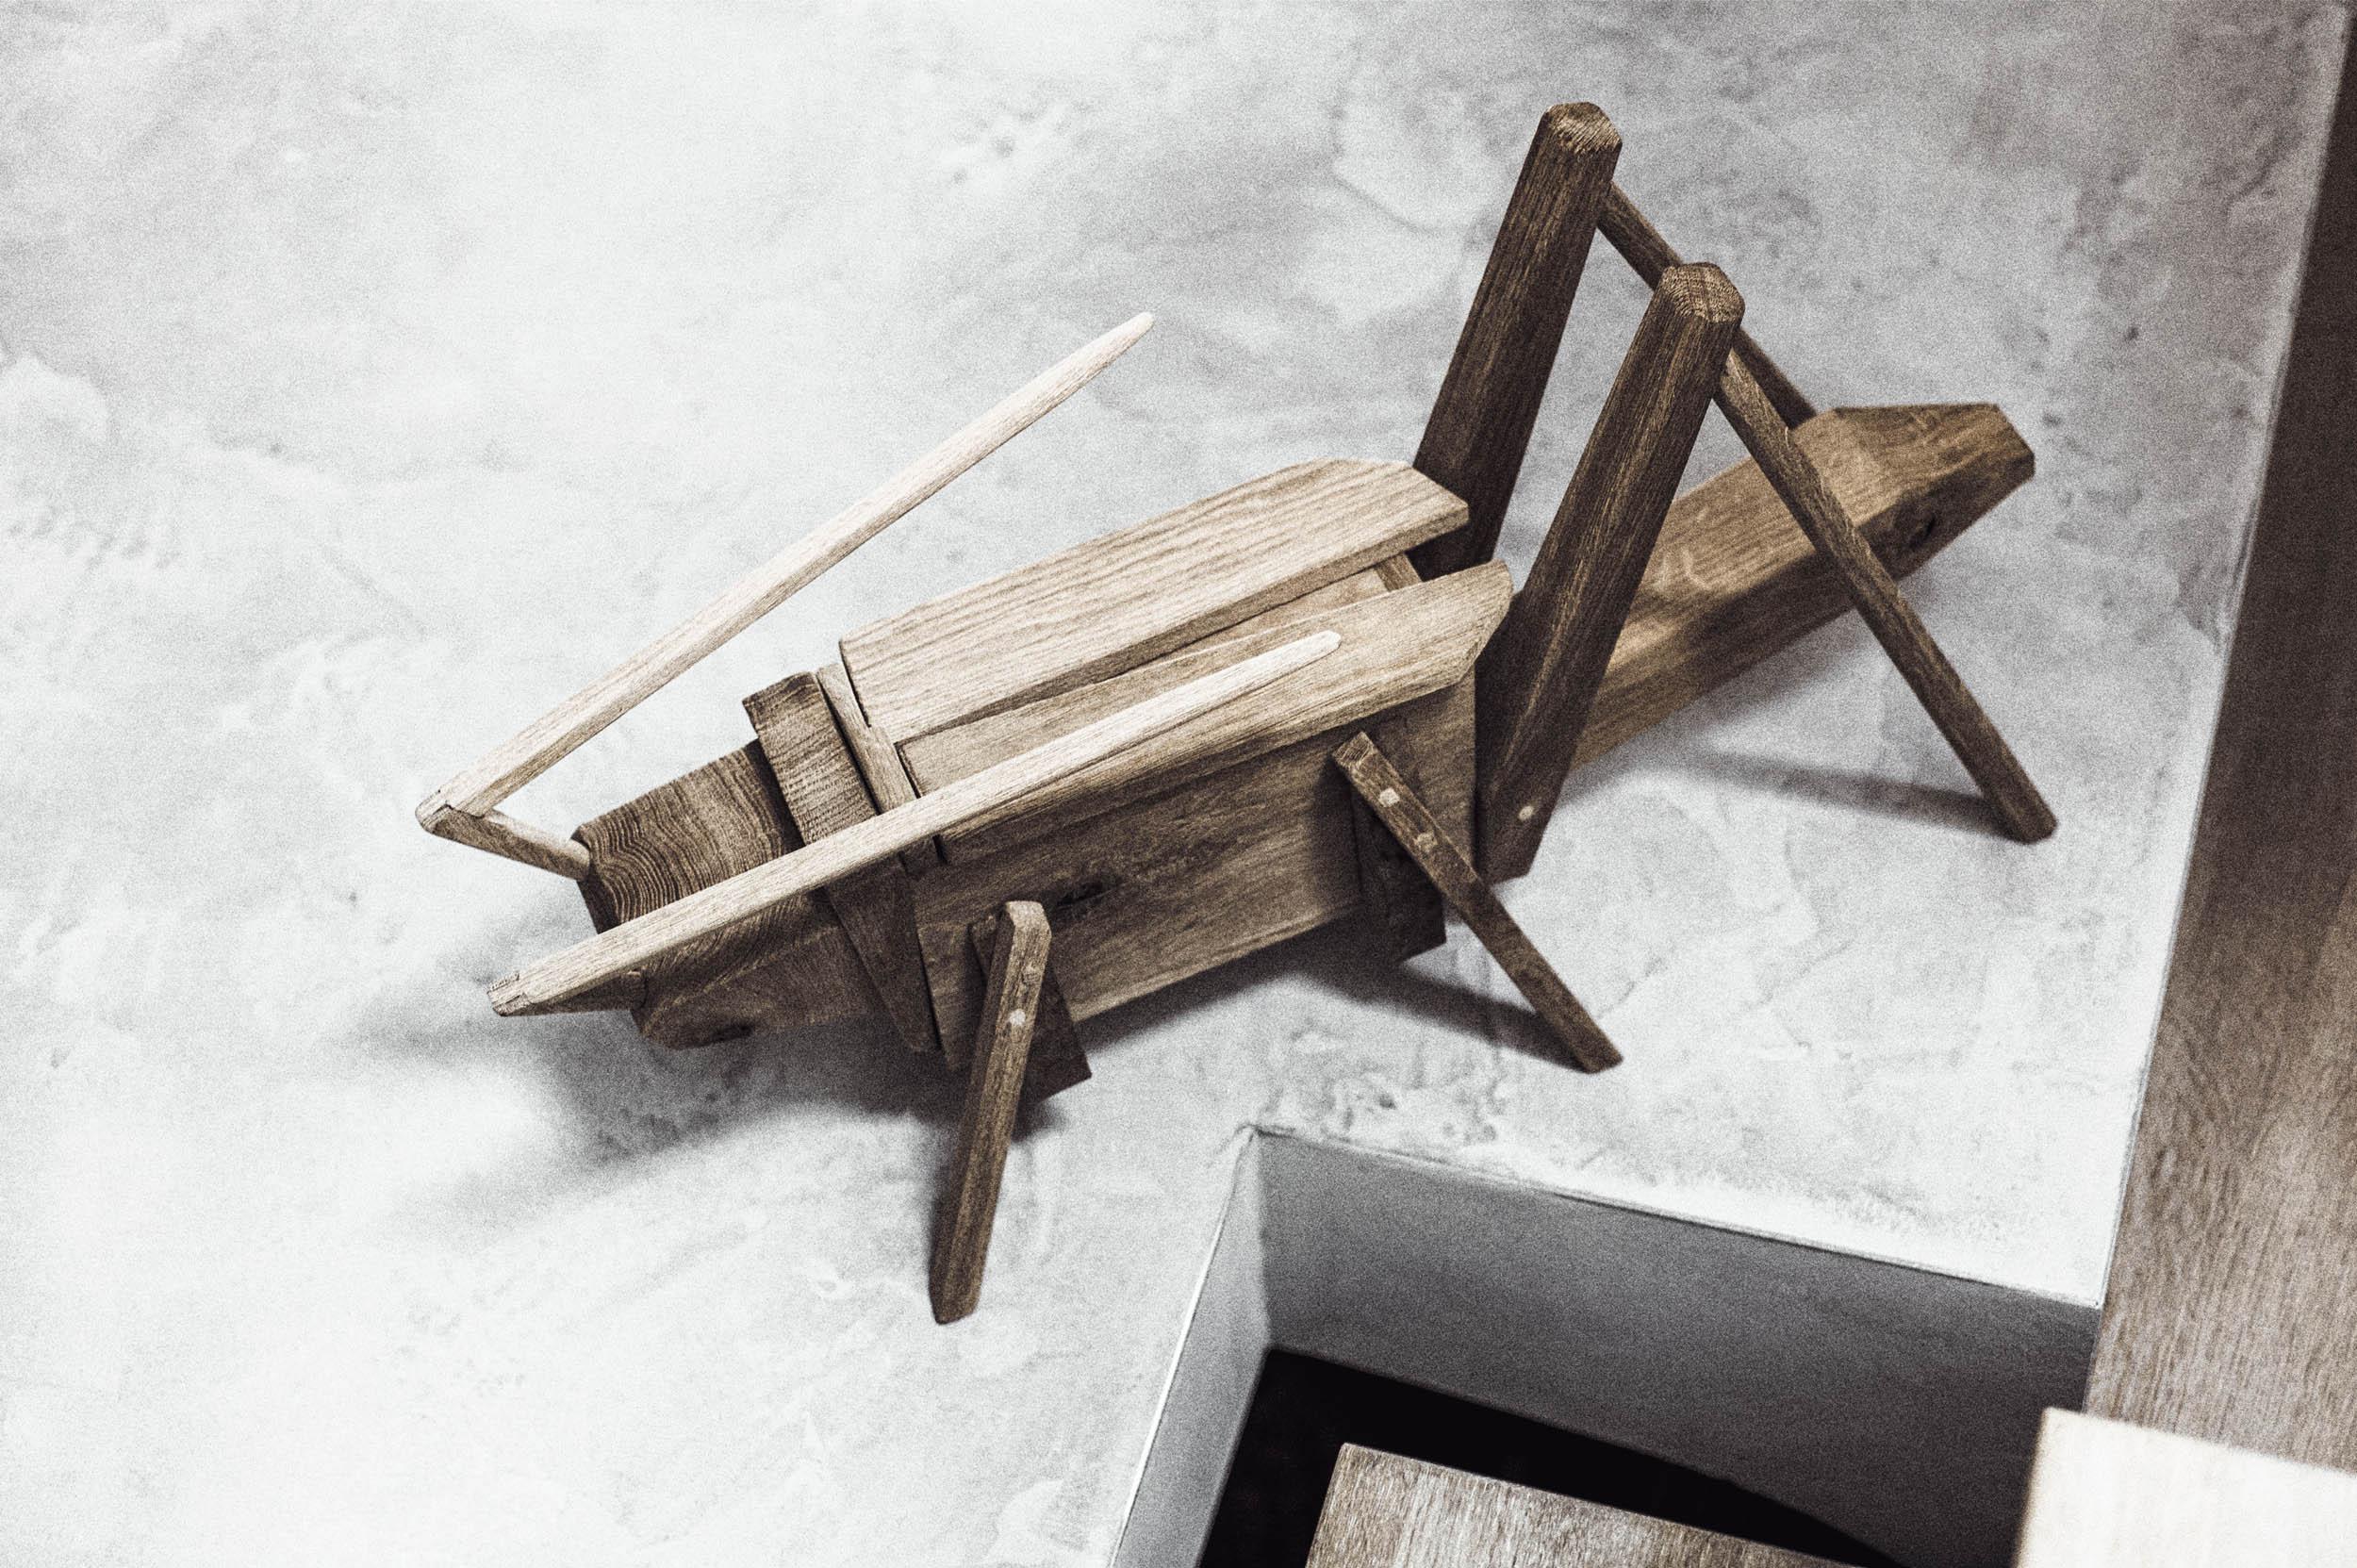 seifertuebler-corporate-handcraft-woodsculpture-vogel-13.jpg